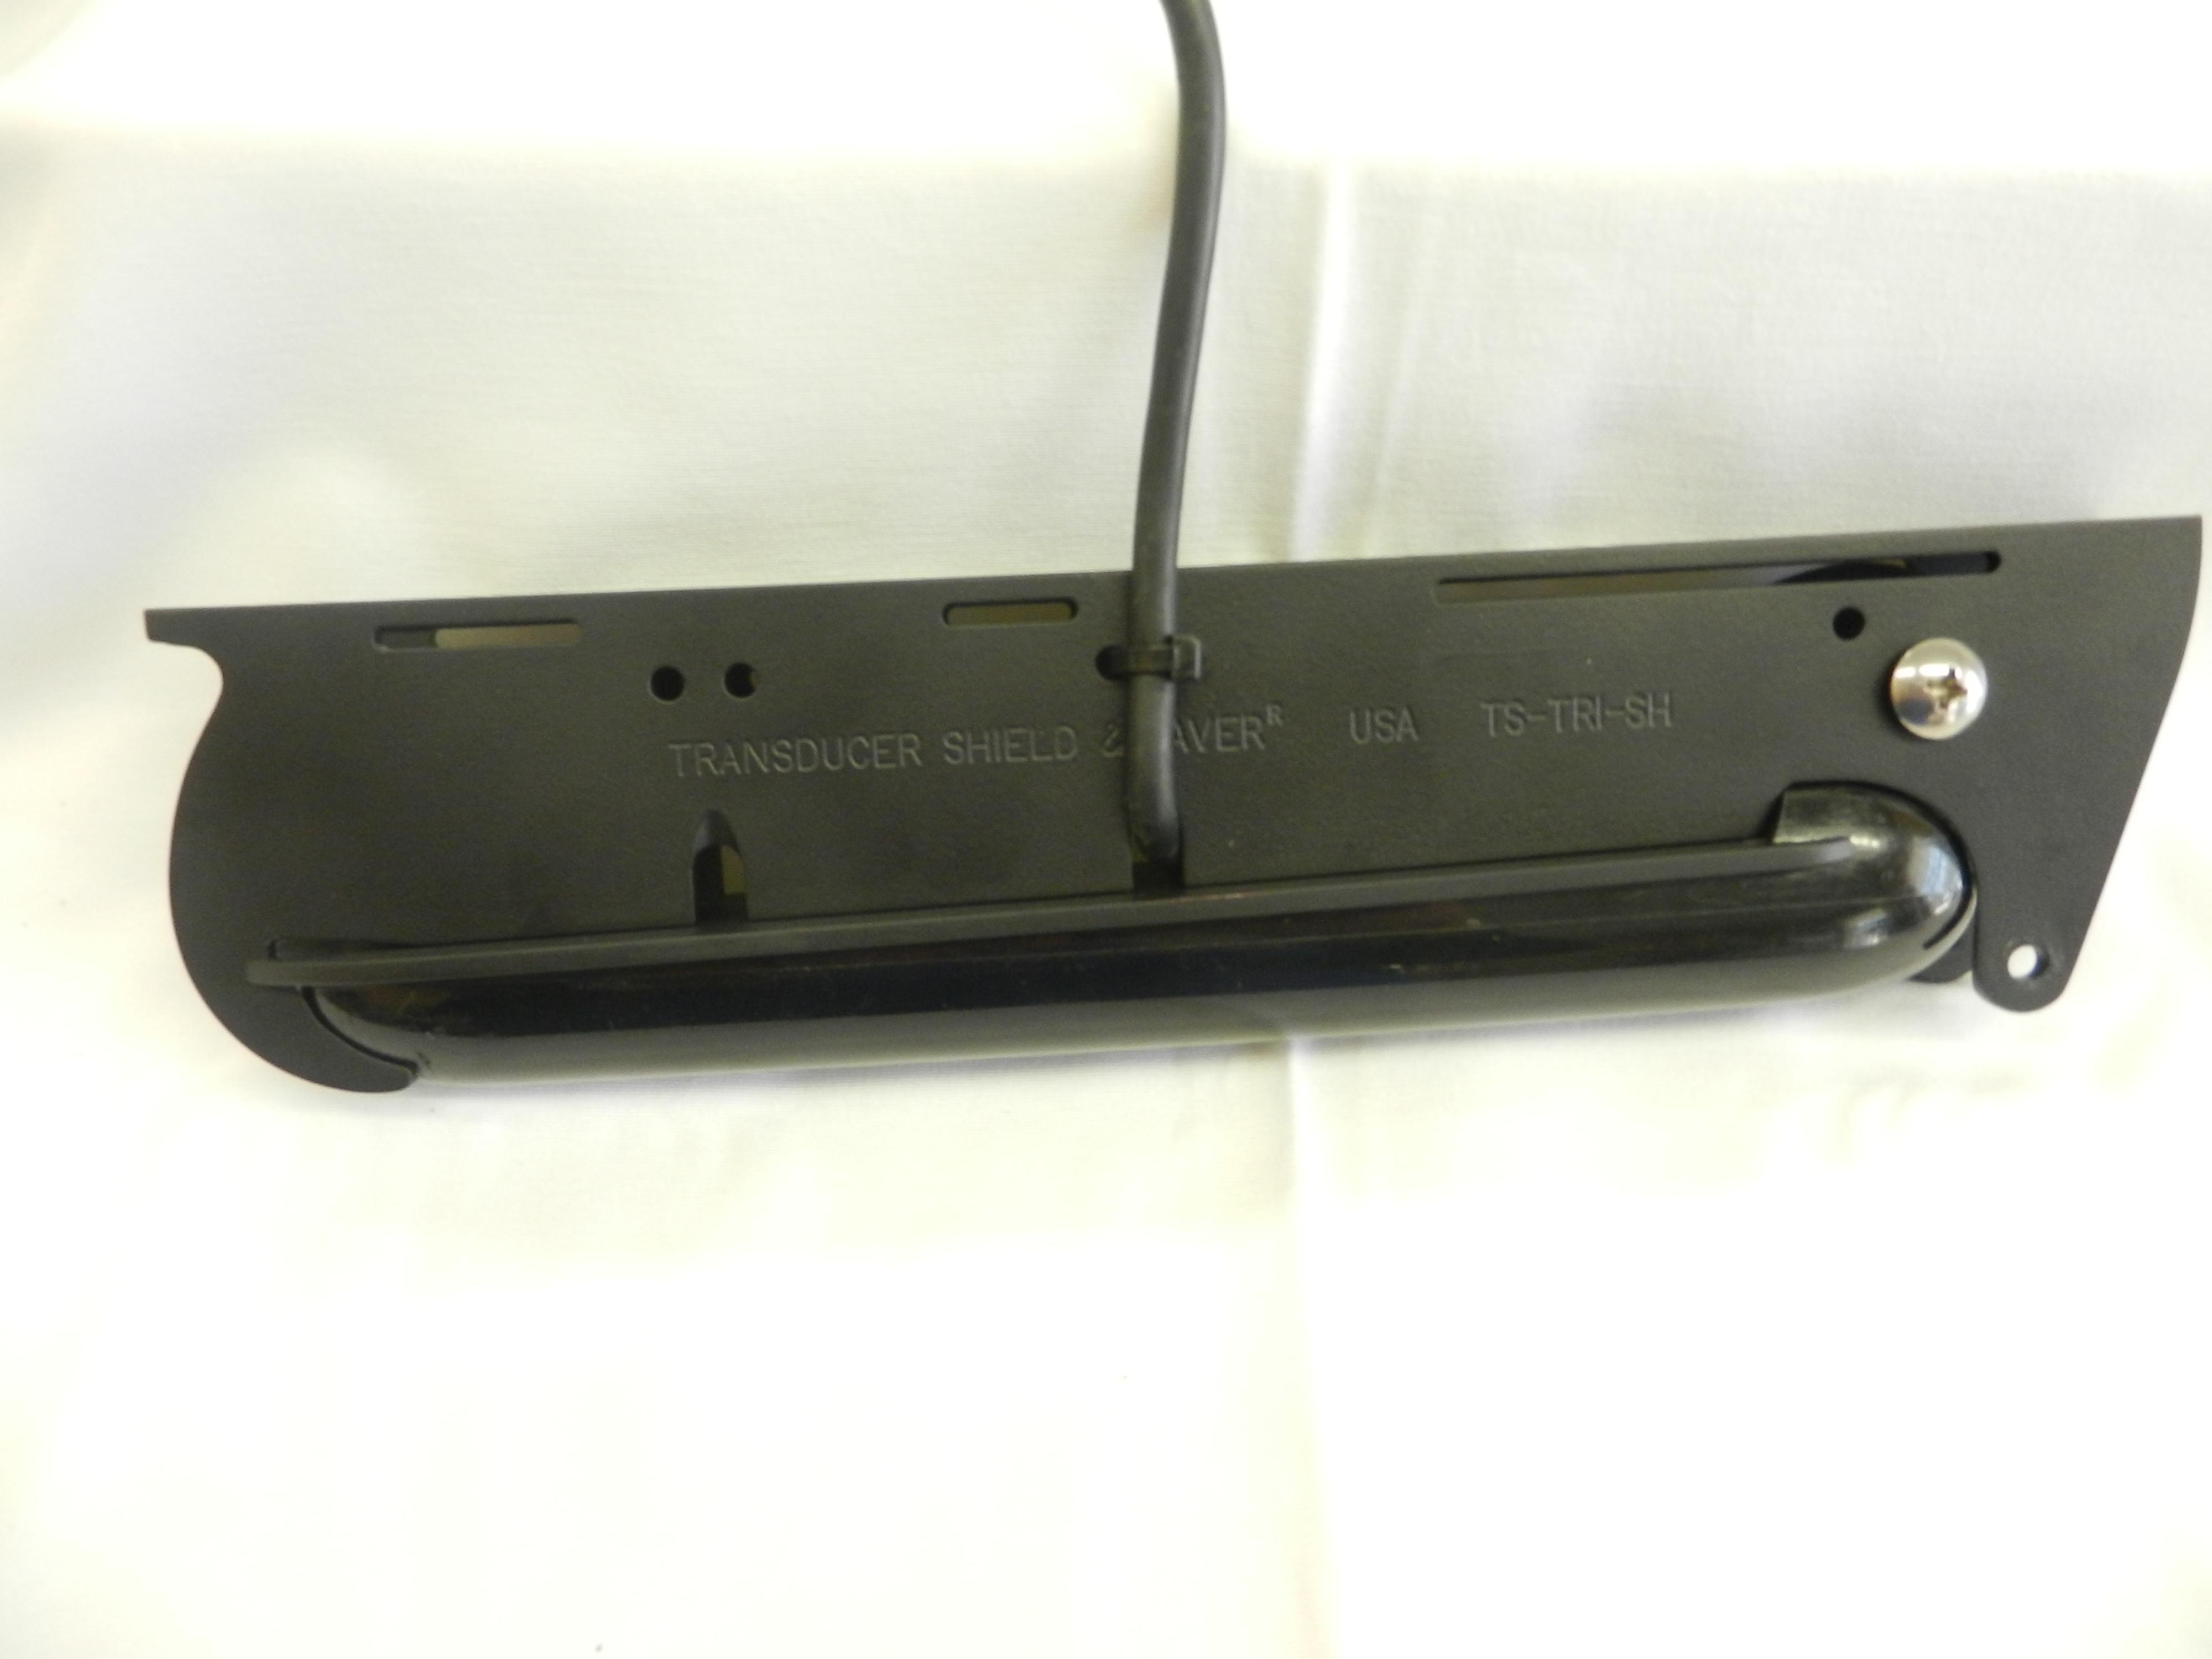 TS-TRI-SH to fit Lowrance Hook 2 Triple Shot Transducer # 000-14029-001 on  Jack Plate, Hole Shot Plate or Set Back